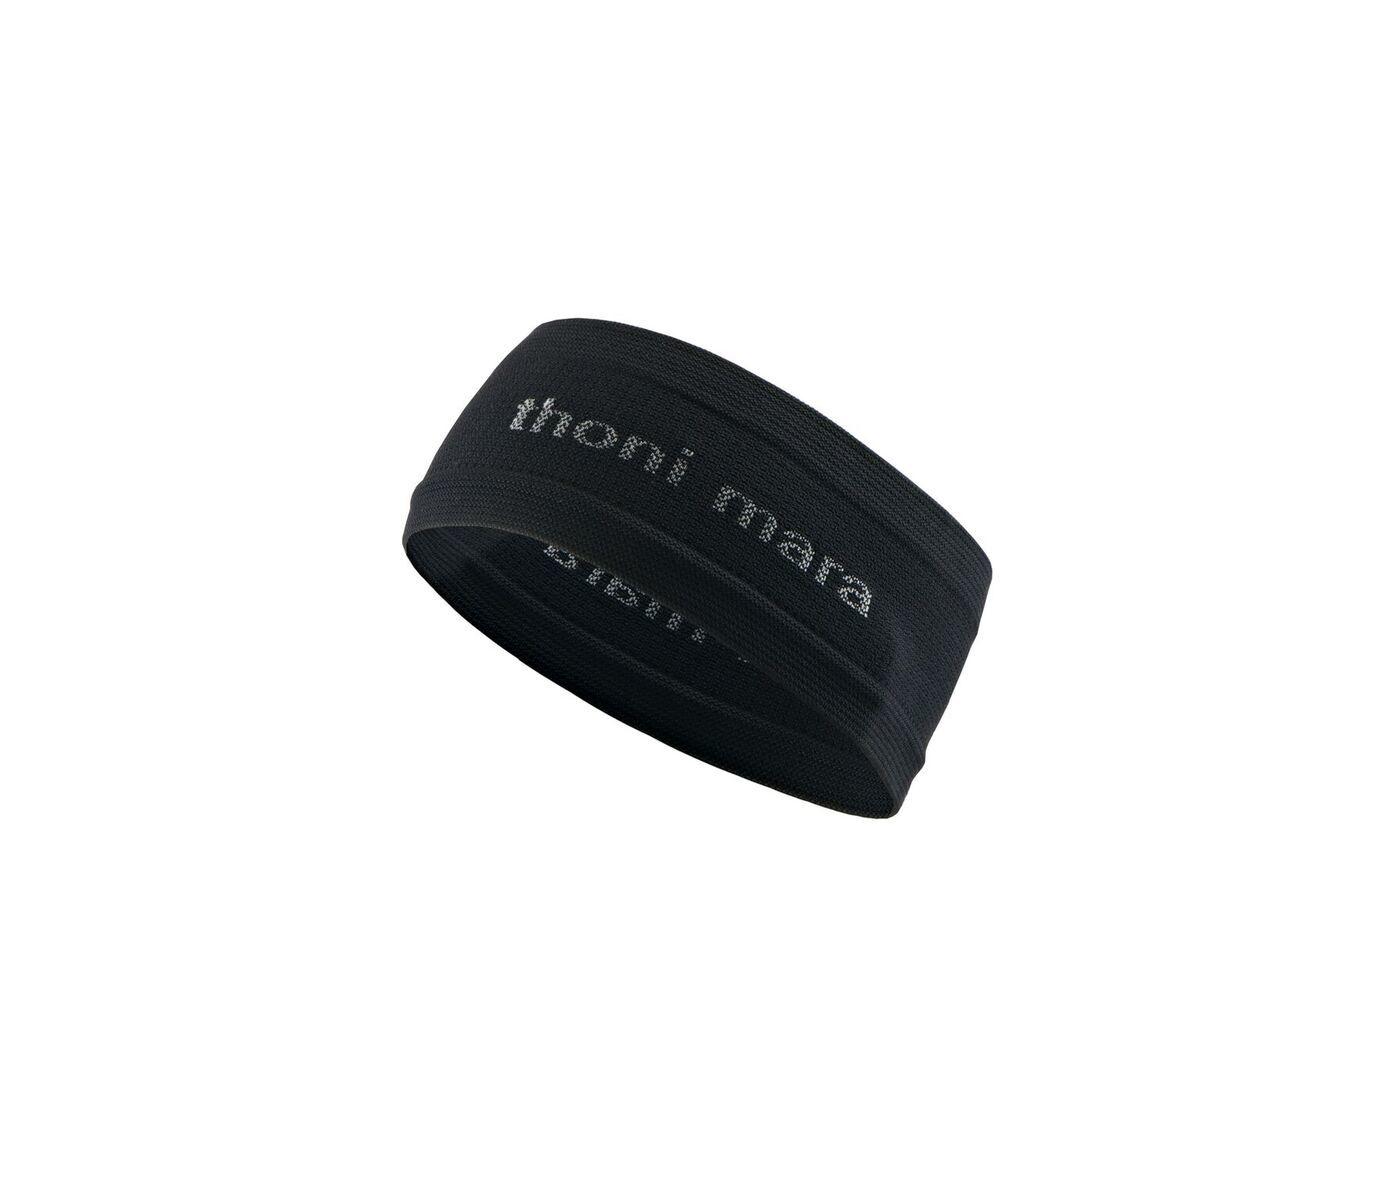 Thonimara Stirnband mini in Schwarz